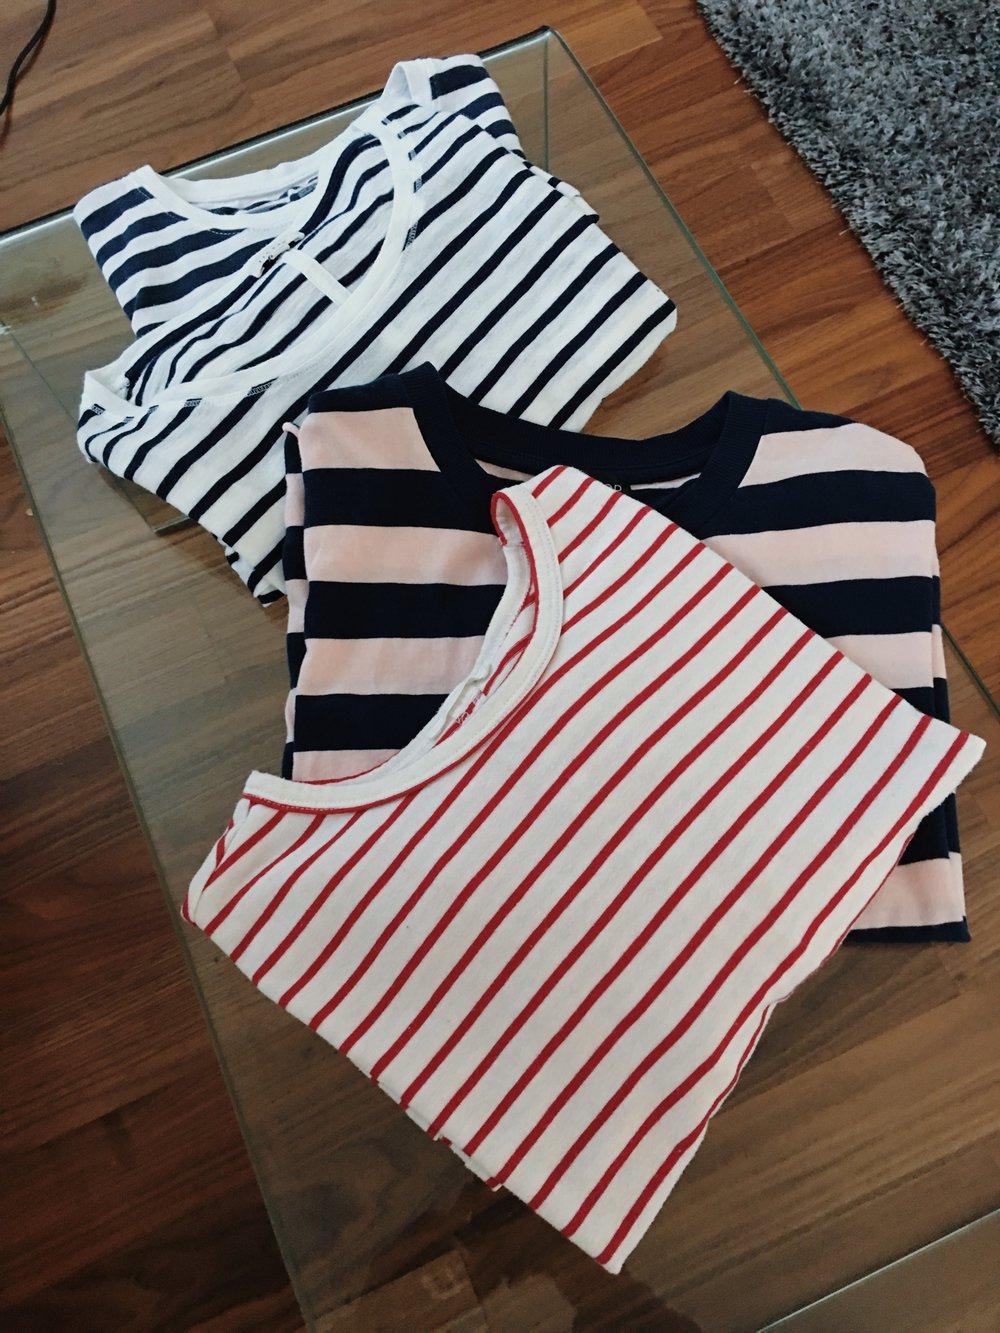 The Striped Wardrobe - jasminehardingmakeup